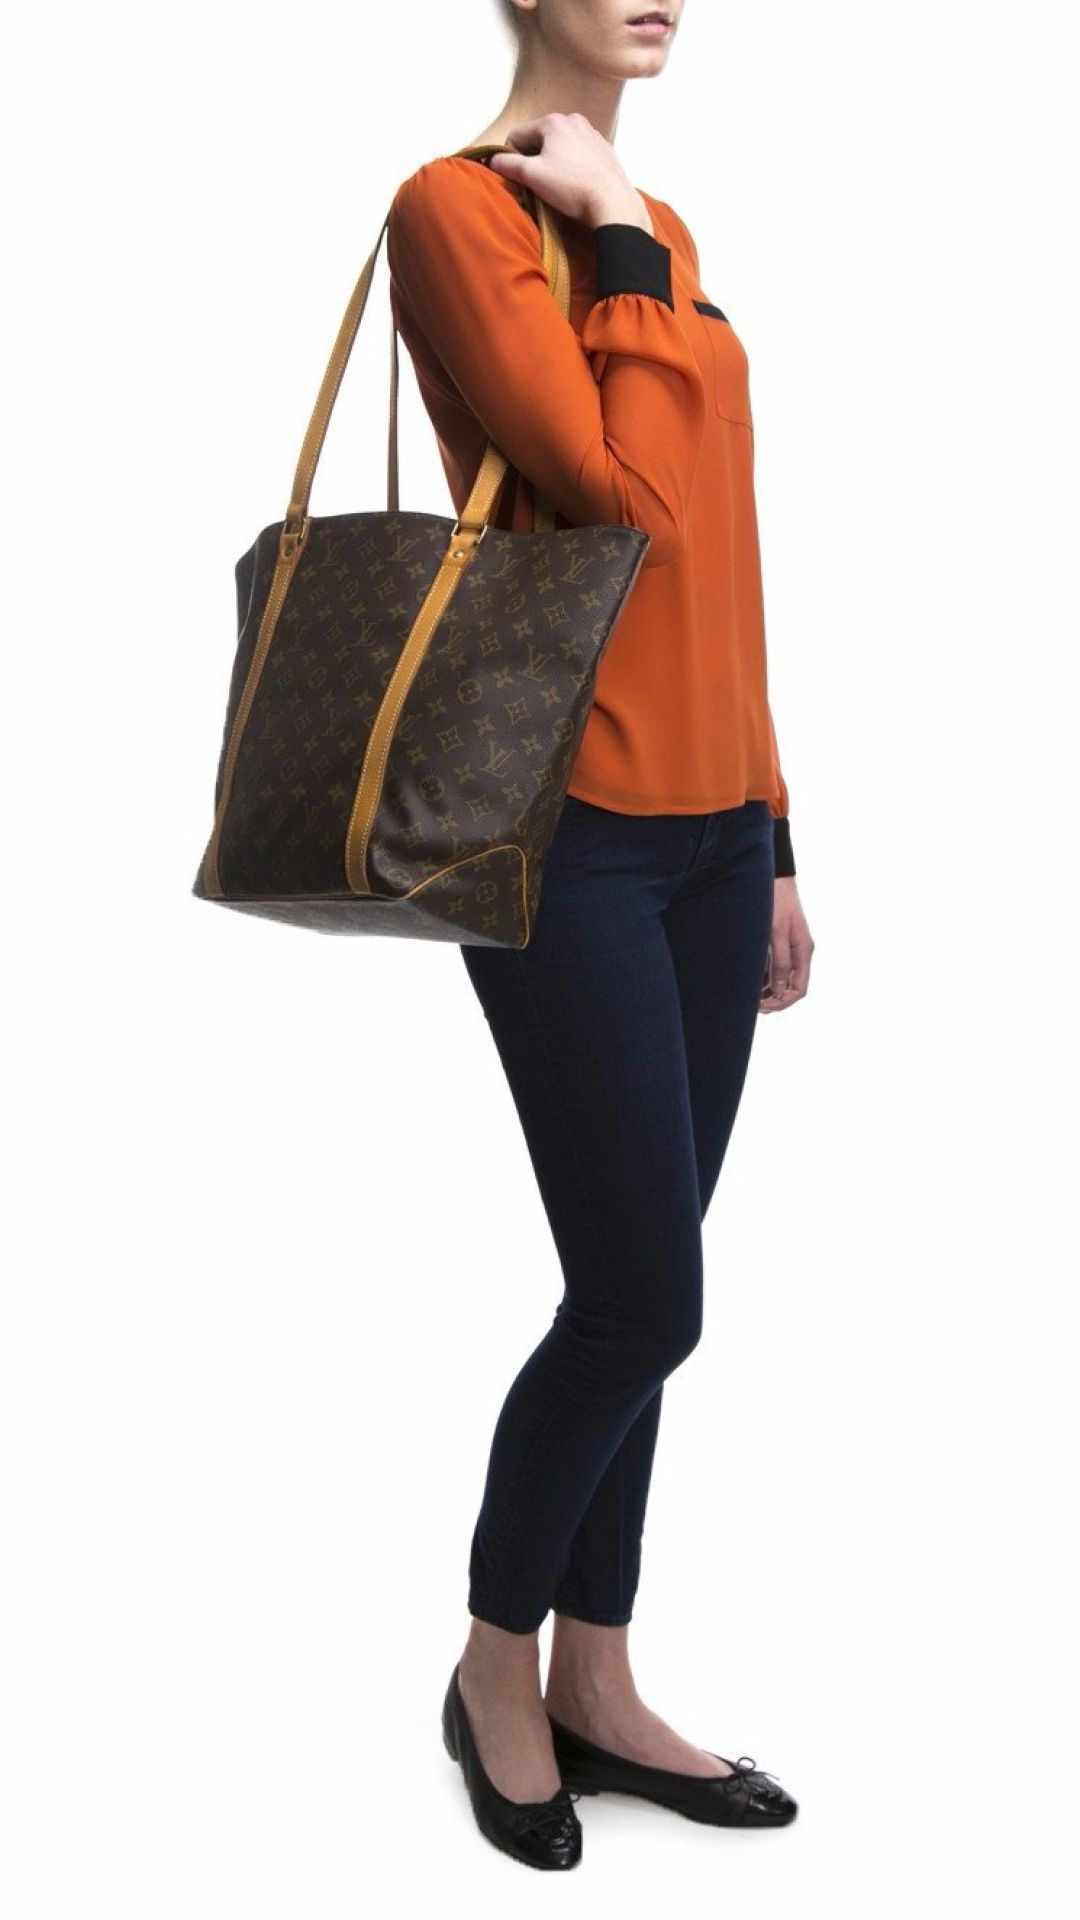 Louis Vuitton Monogram Canvas Sac Shopping PM Tote Bag